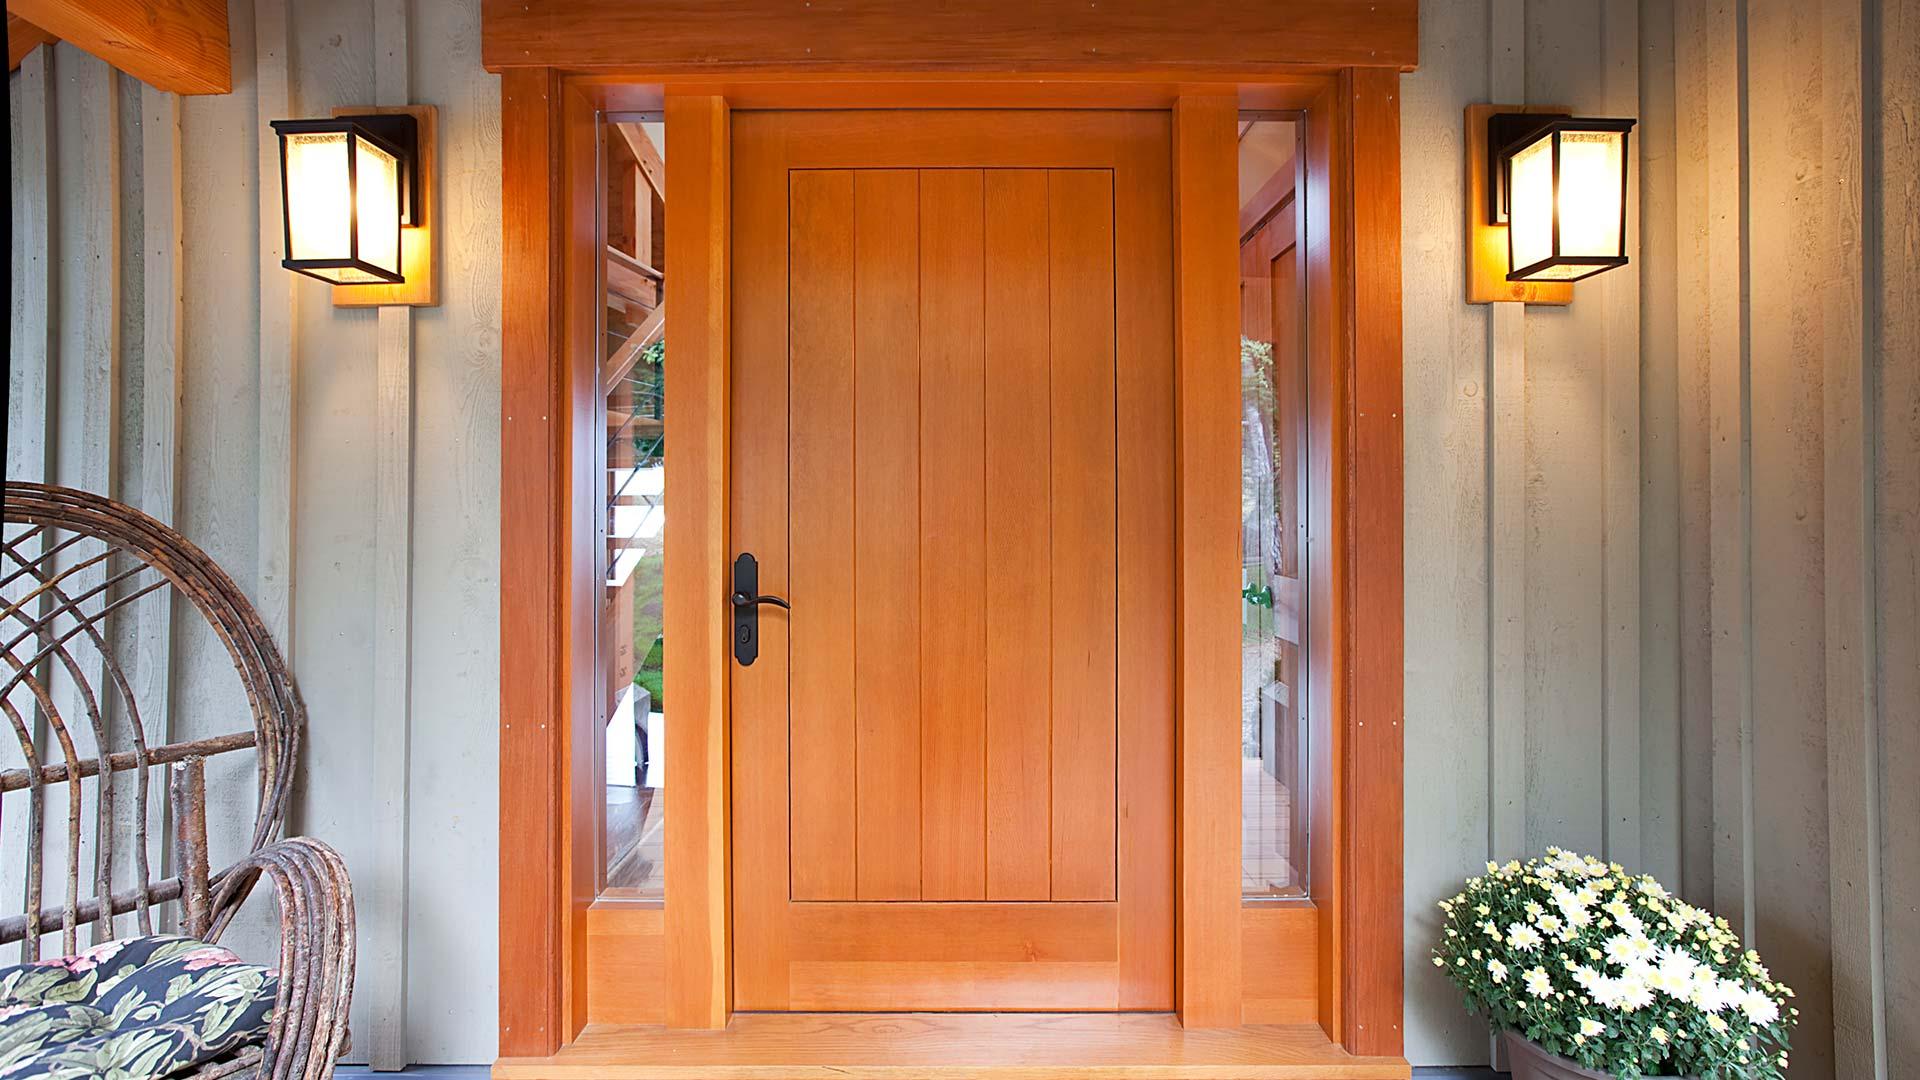 portapivot pivoting and divider pivot dividers door for custom xl sliding hardware glass doors interior made room